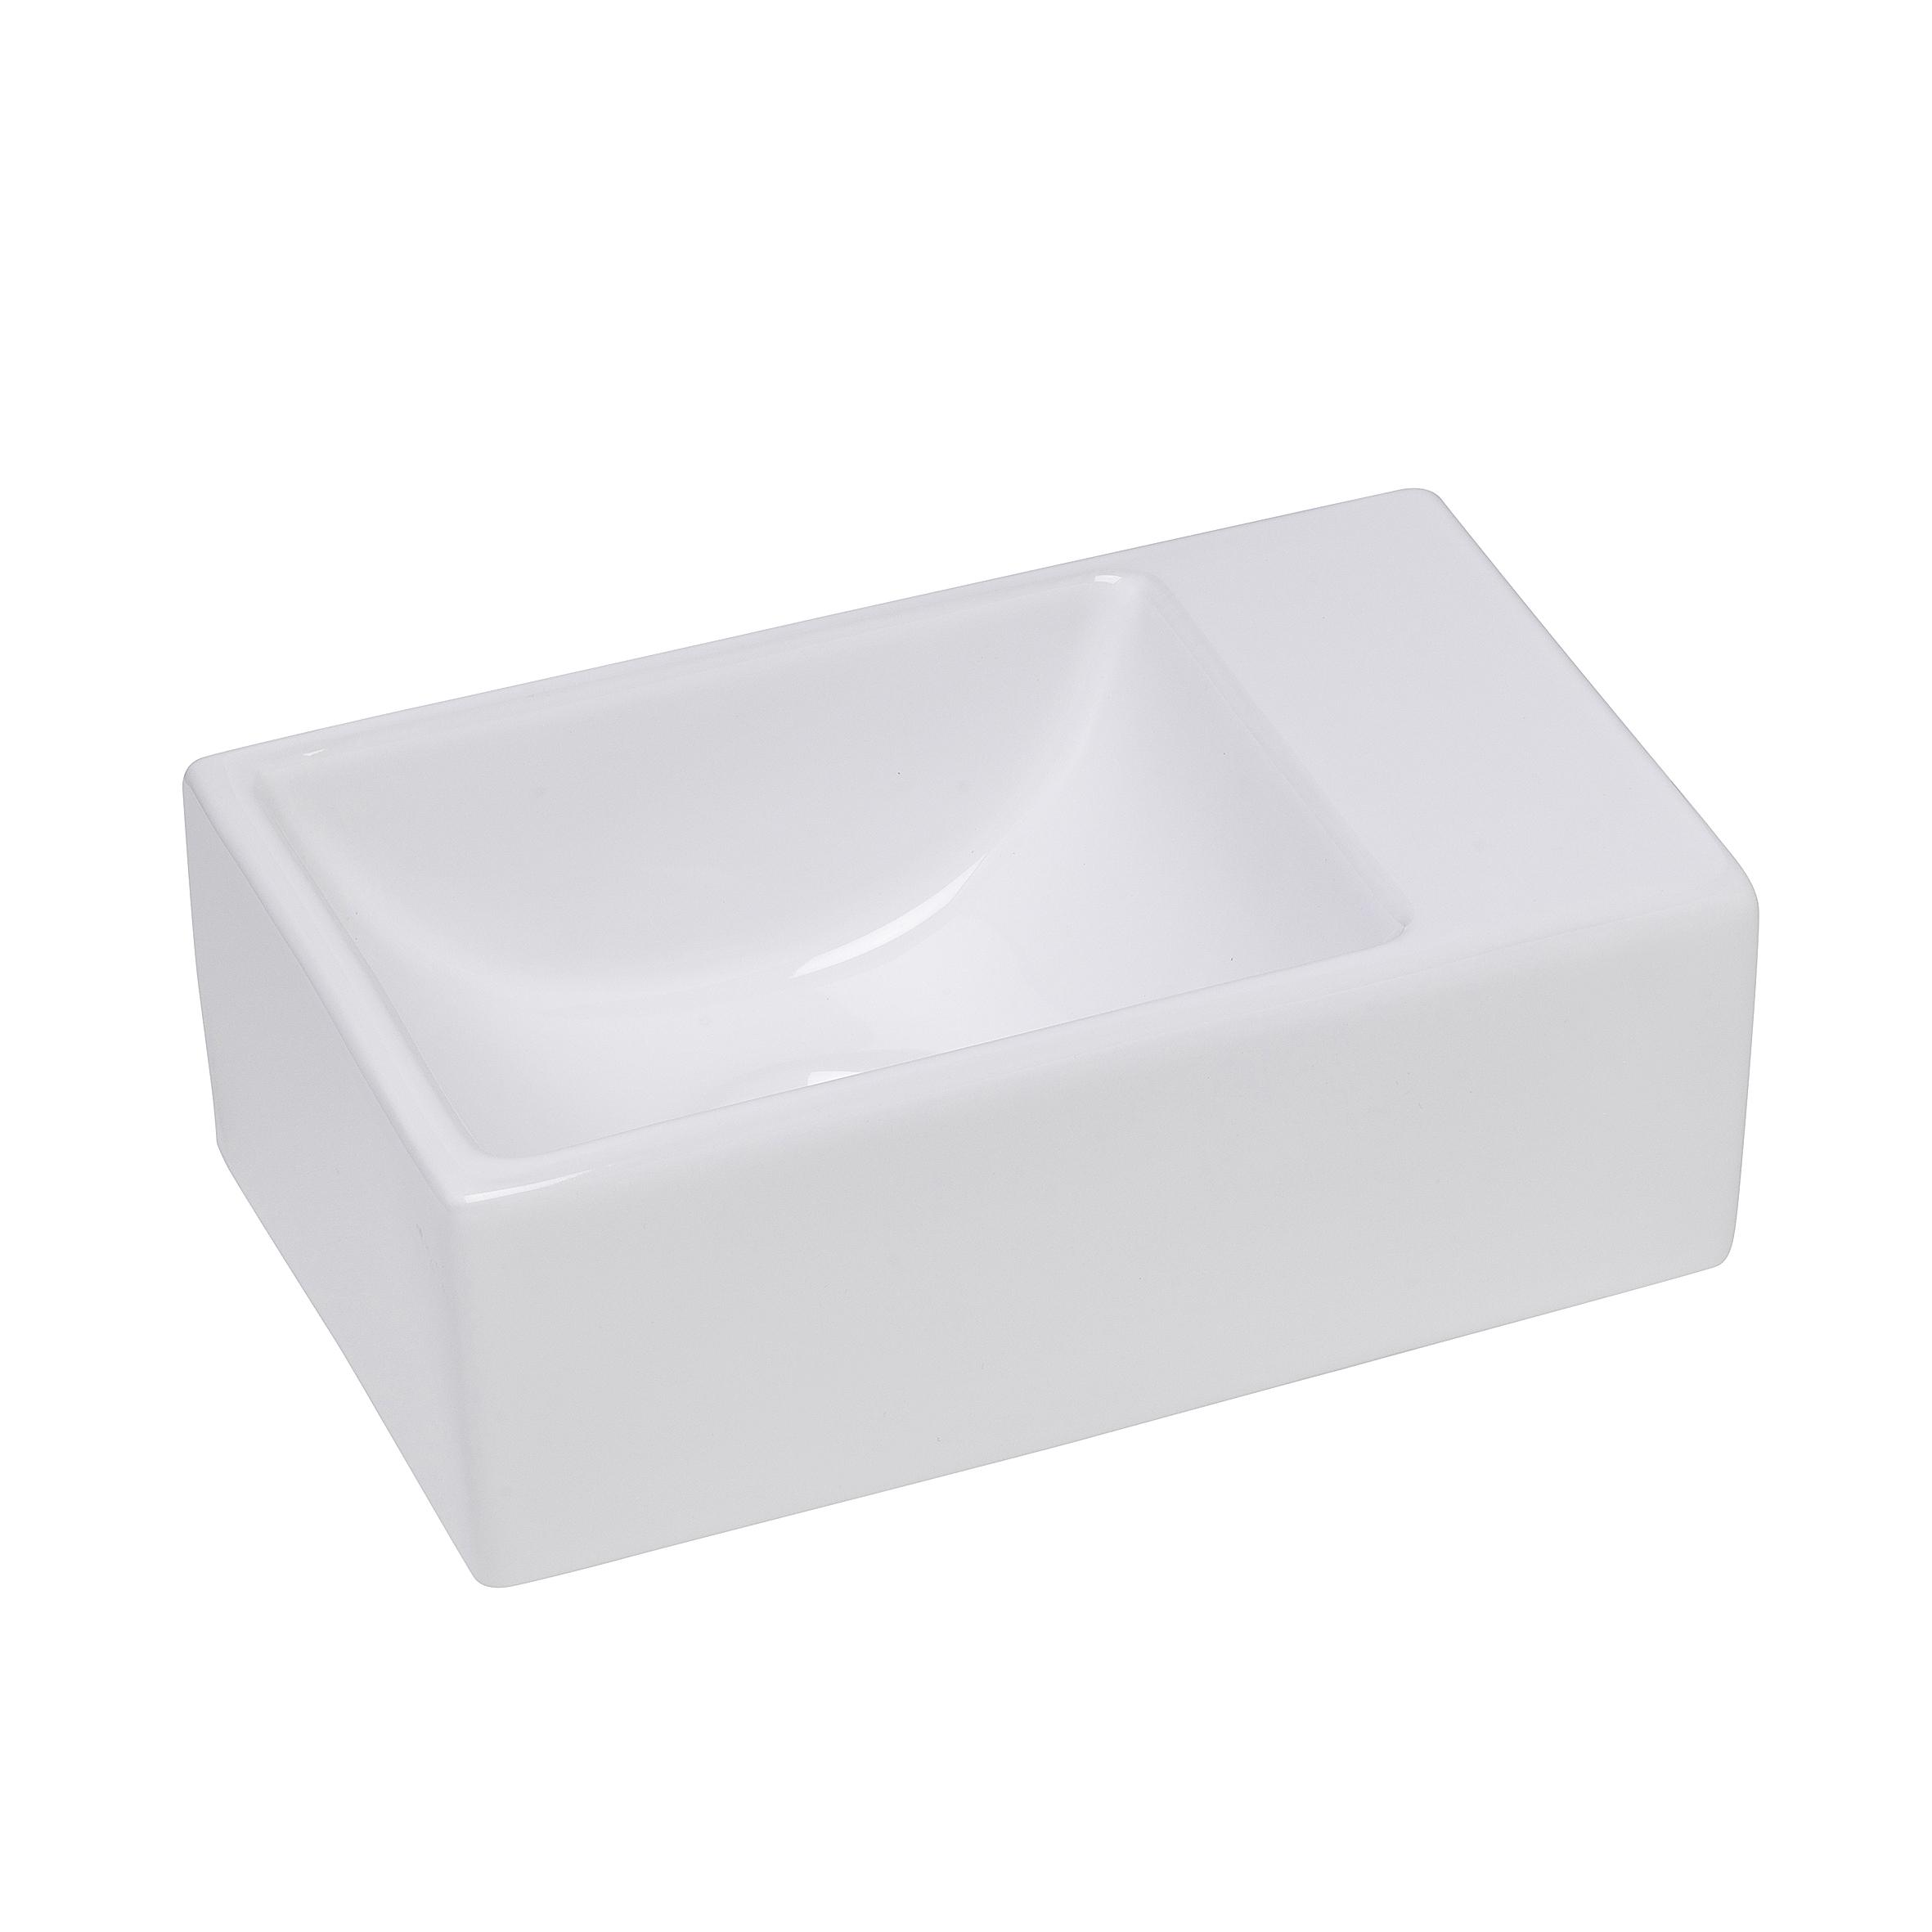 Mueller Apa XXS fontein 305x180x110 zonder kraangat wit